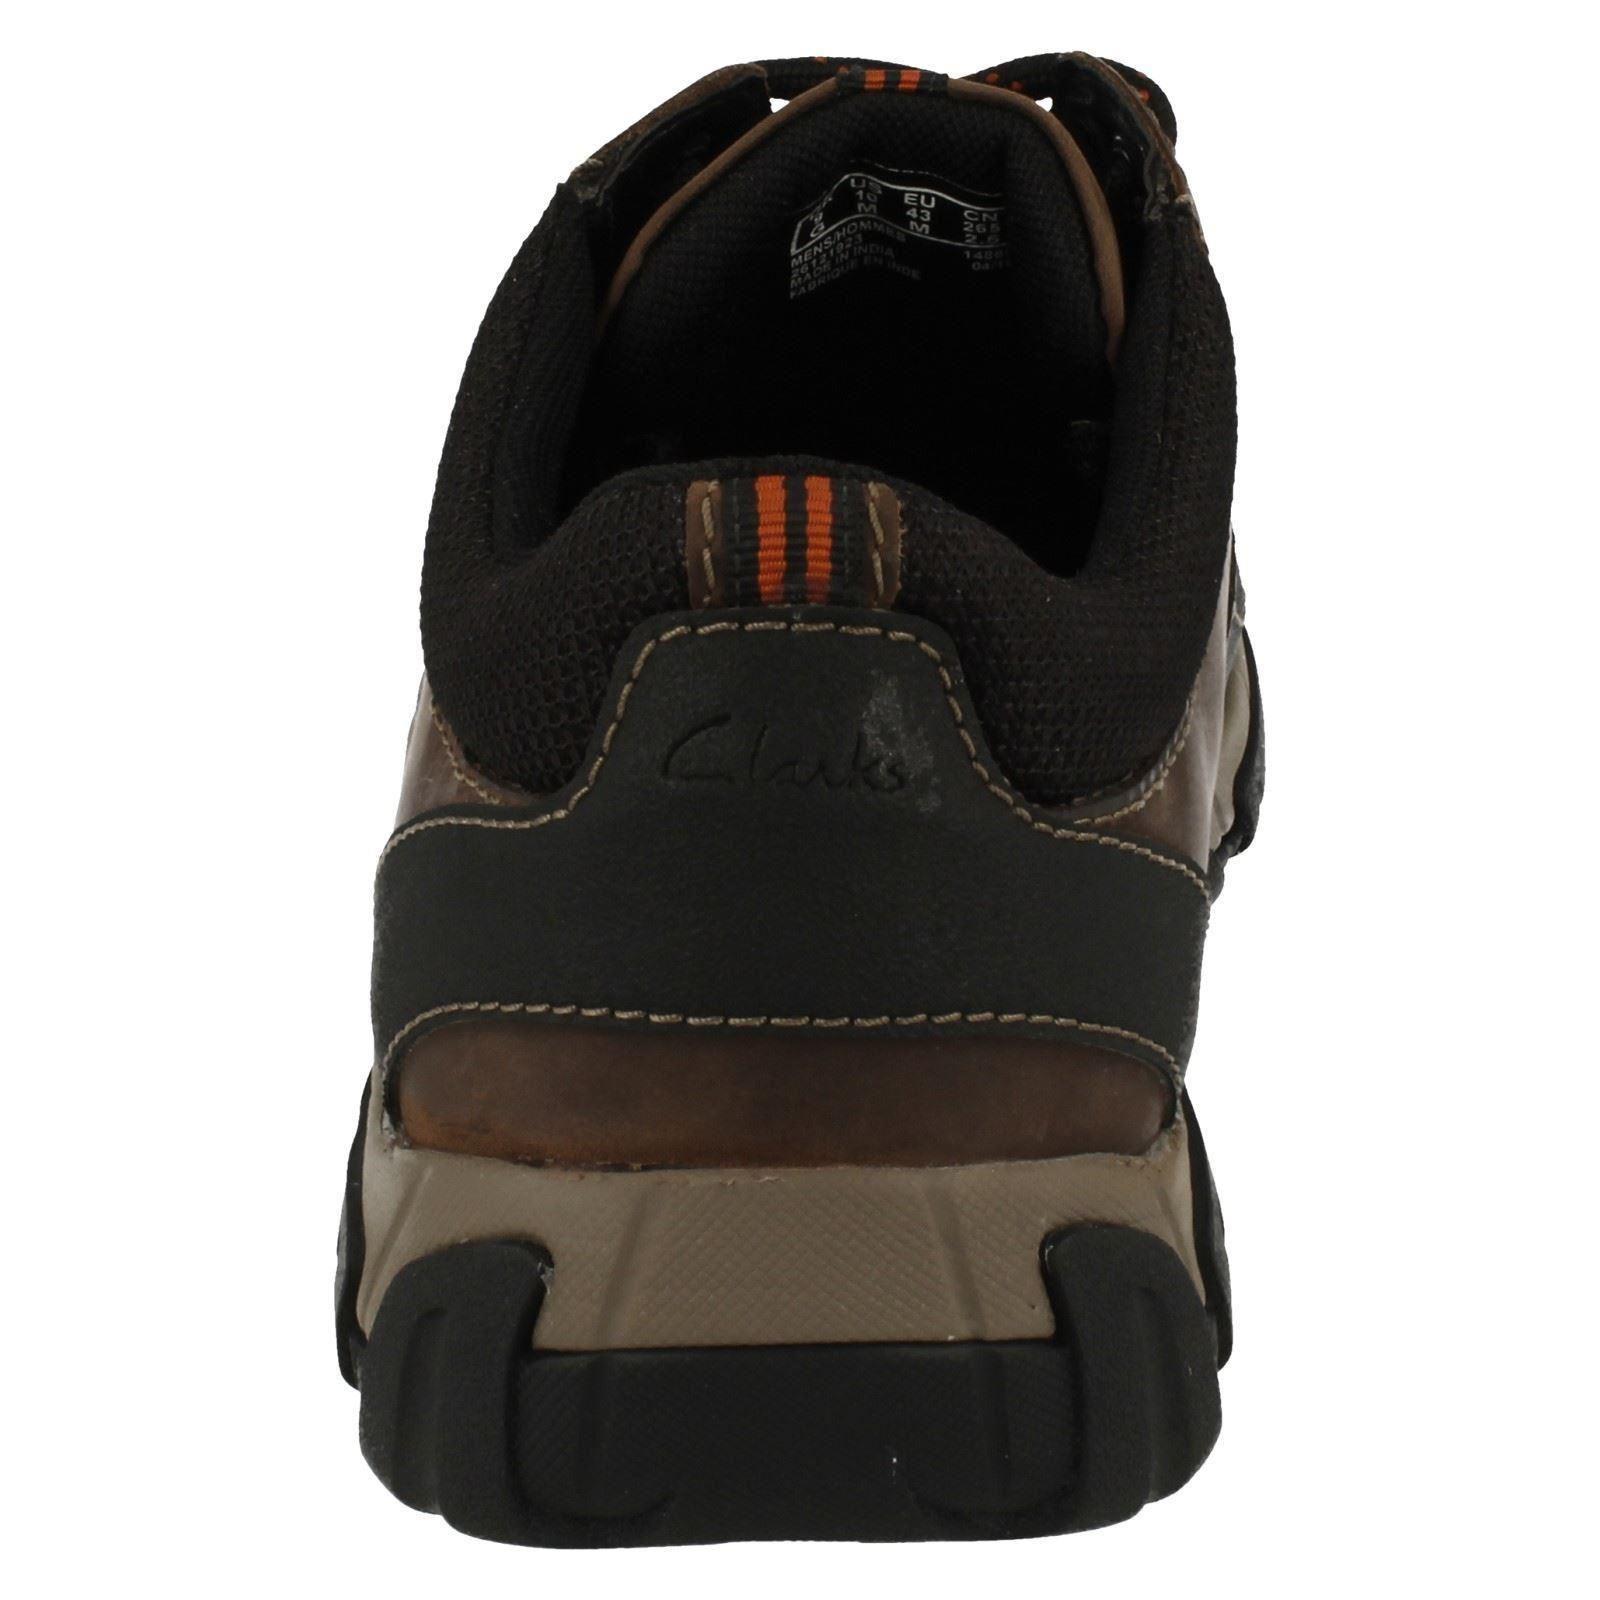 "Clarks Pour Homme Casual Imperméable Lacets Chaussures /""Walbeck Edge/"""